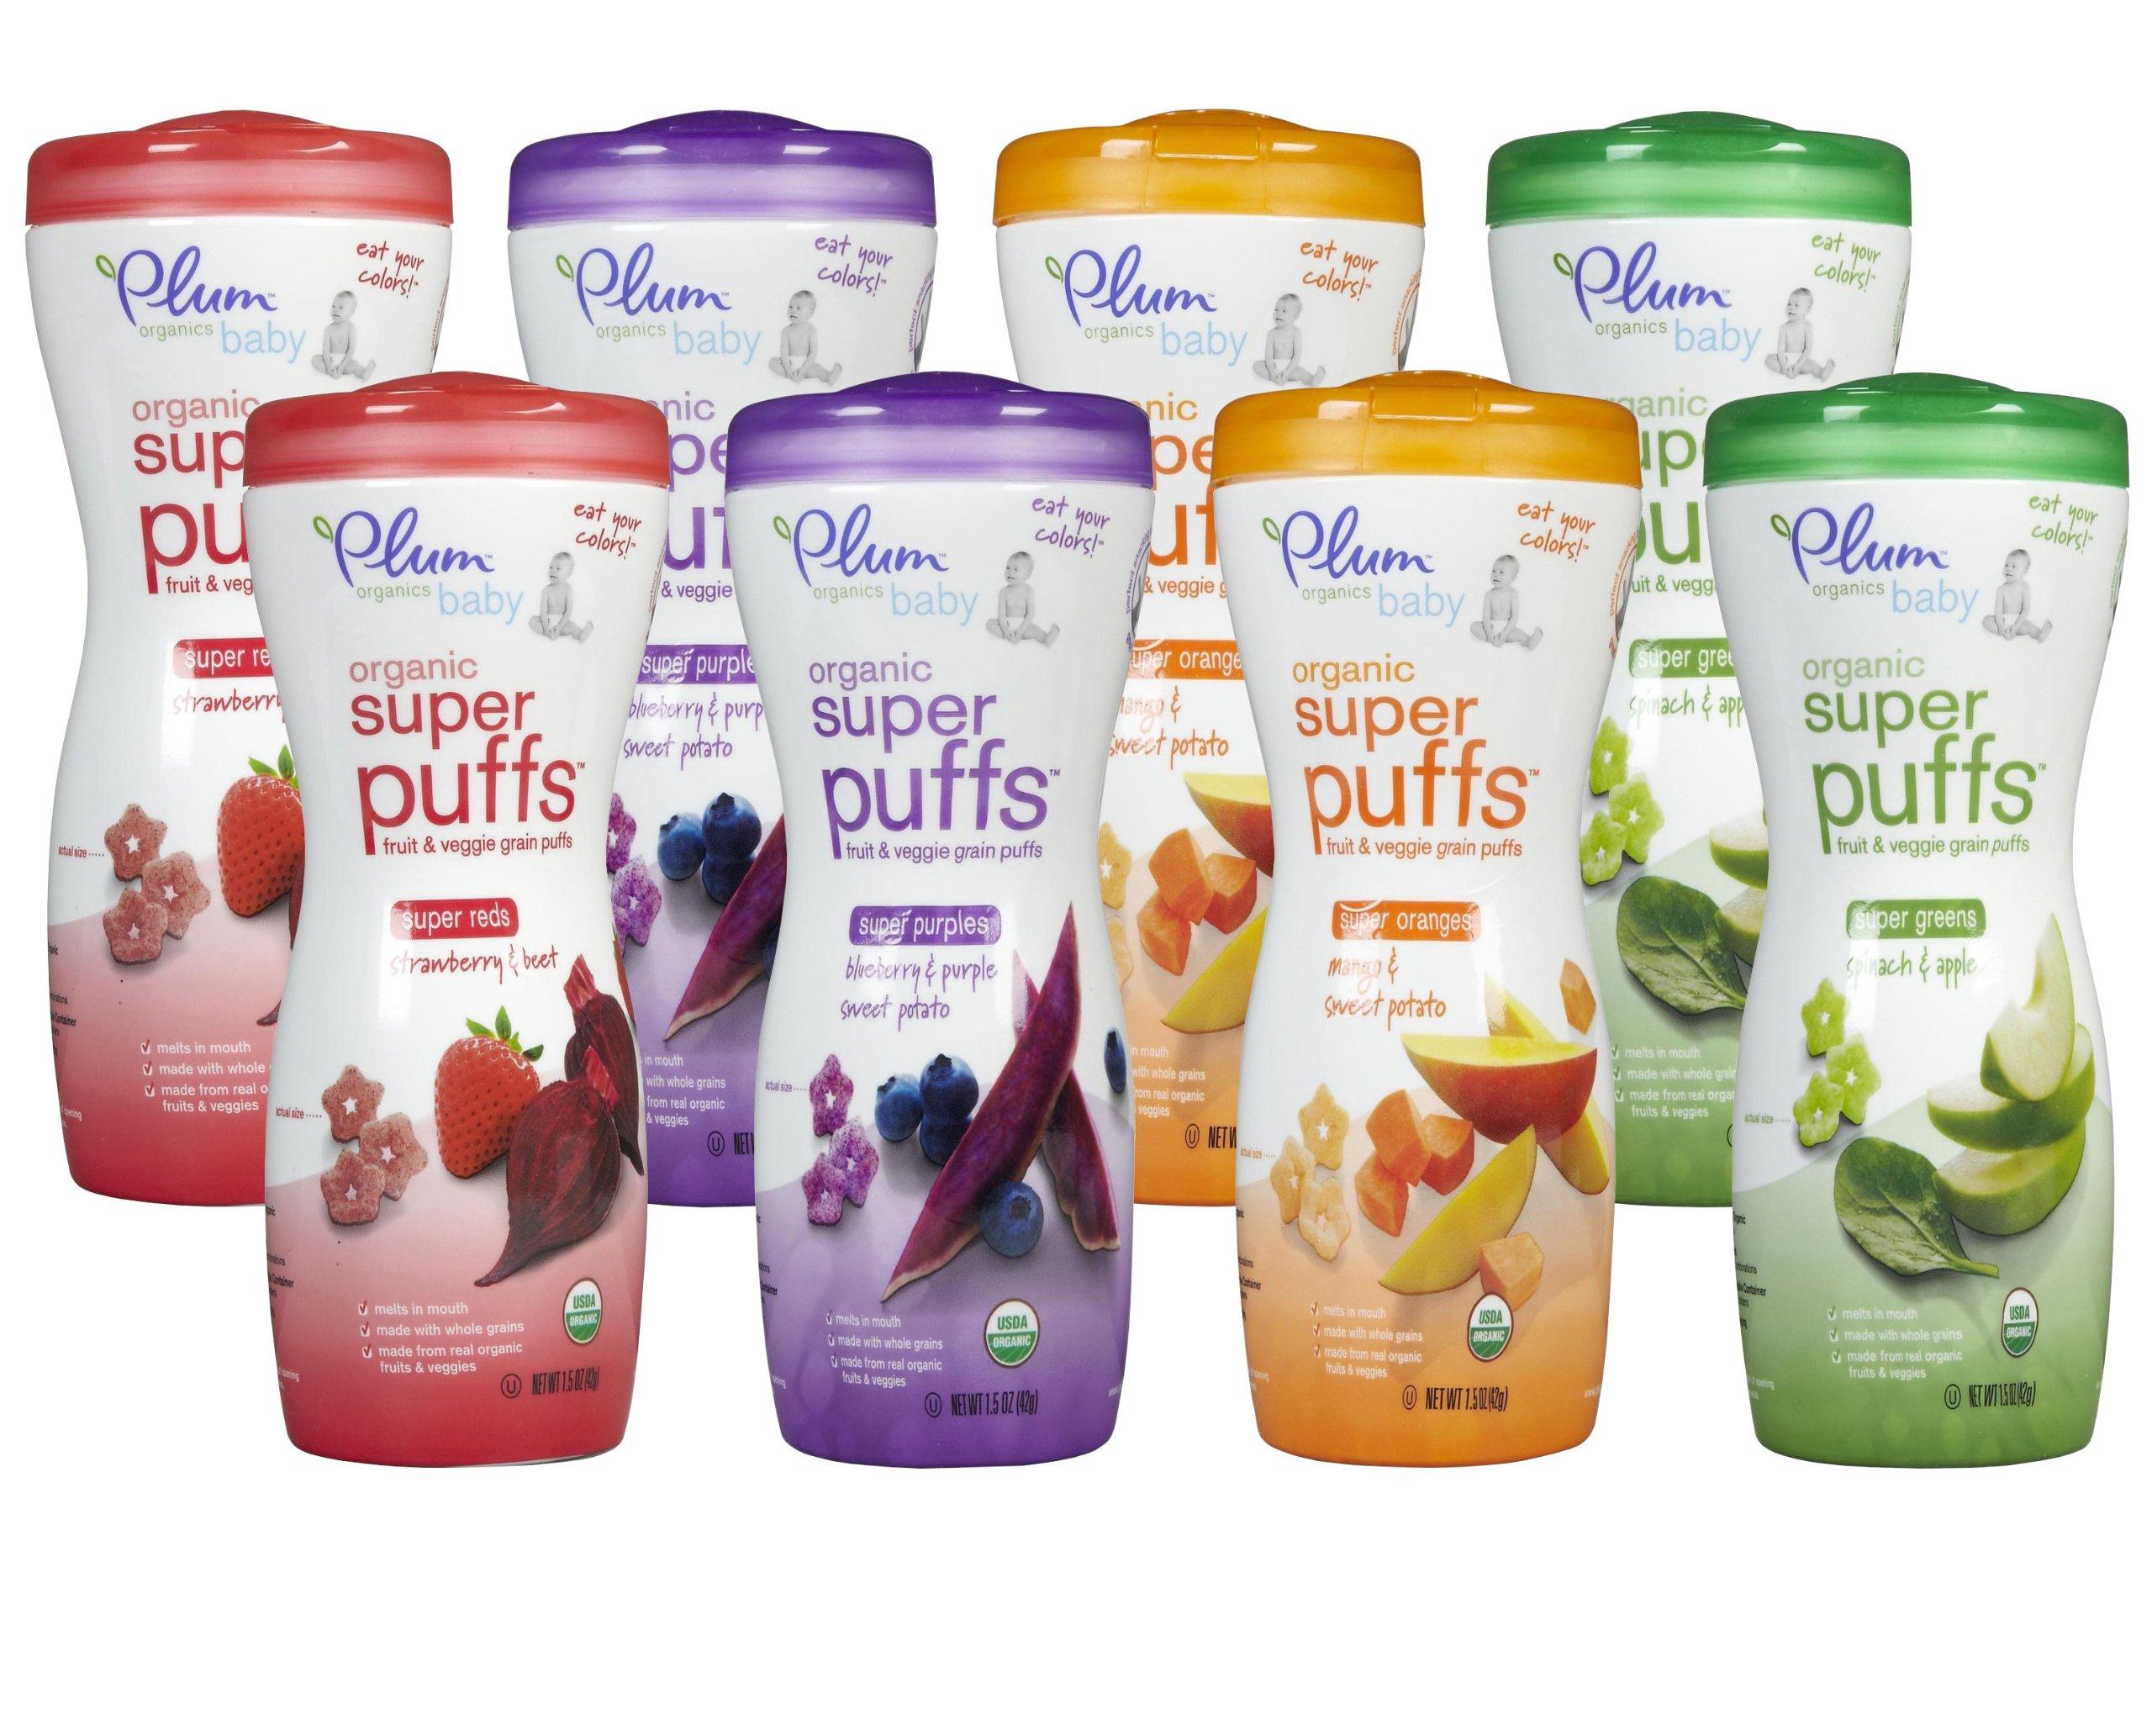 Plum Organics Super Puffs Variety Pack 1.5oz (Set of 8)